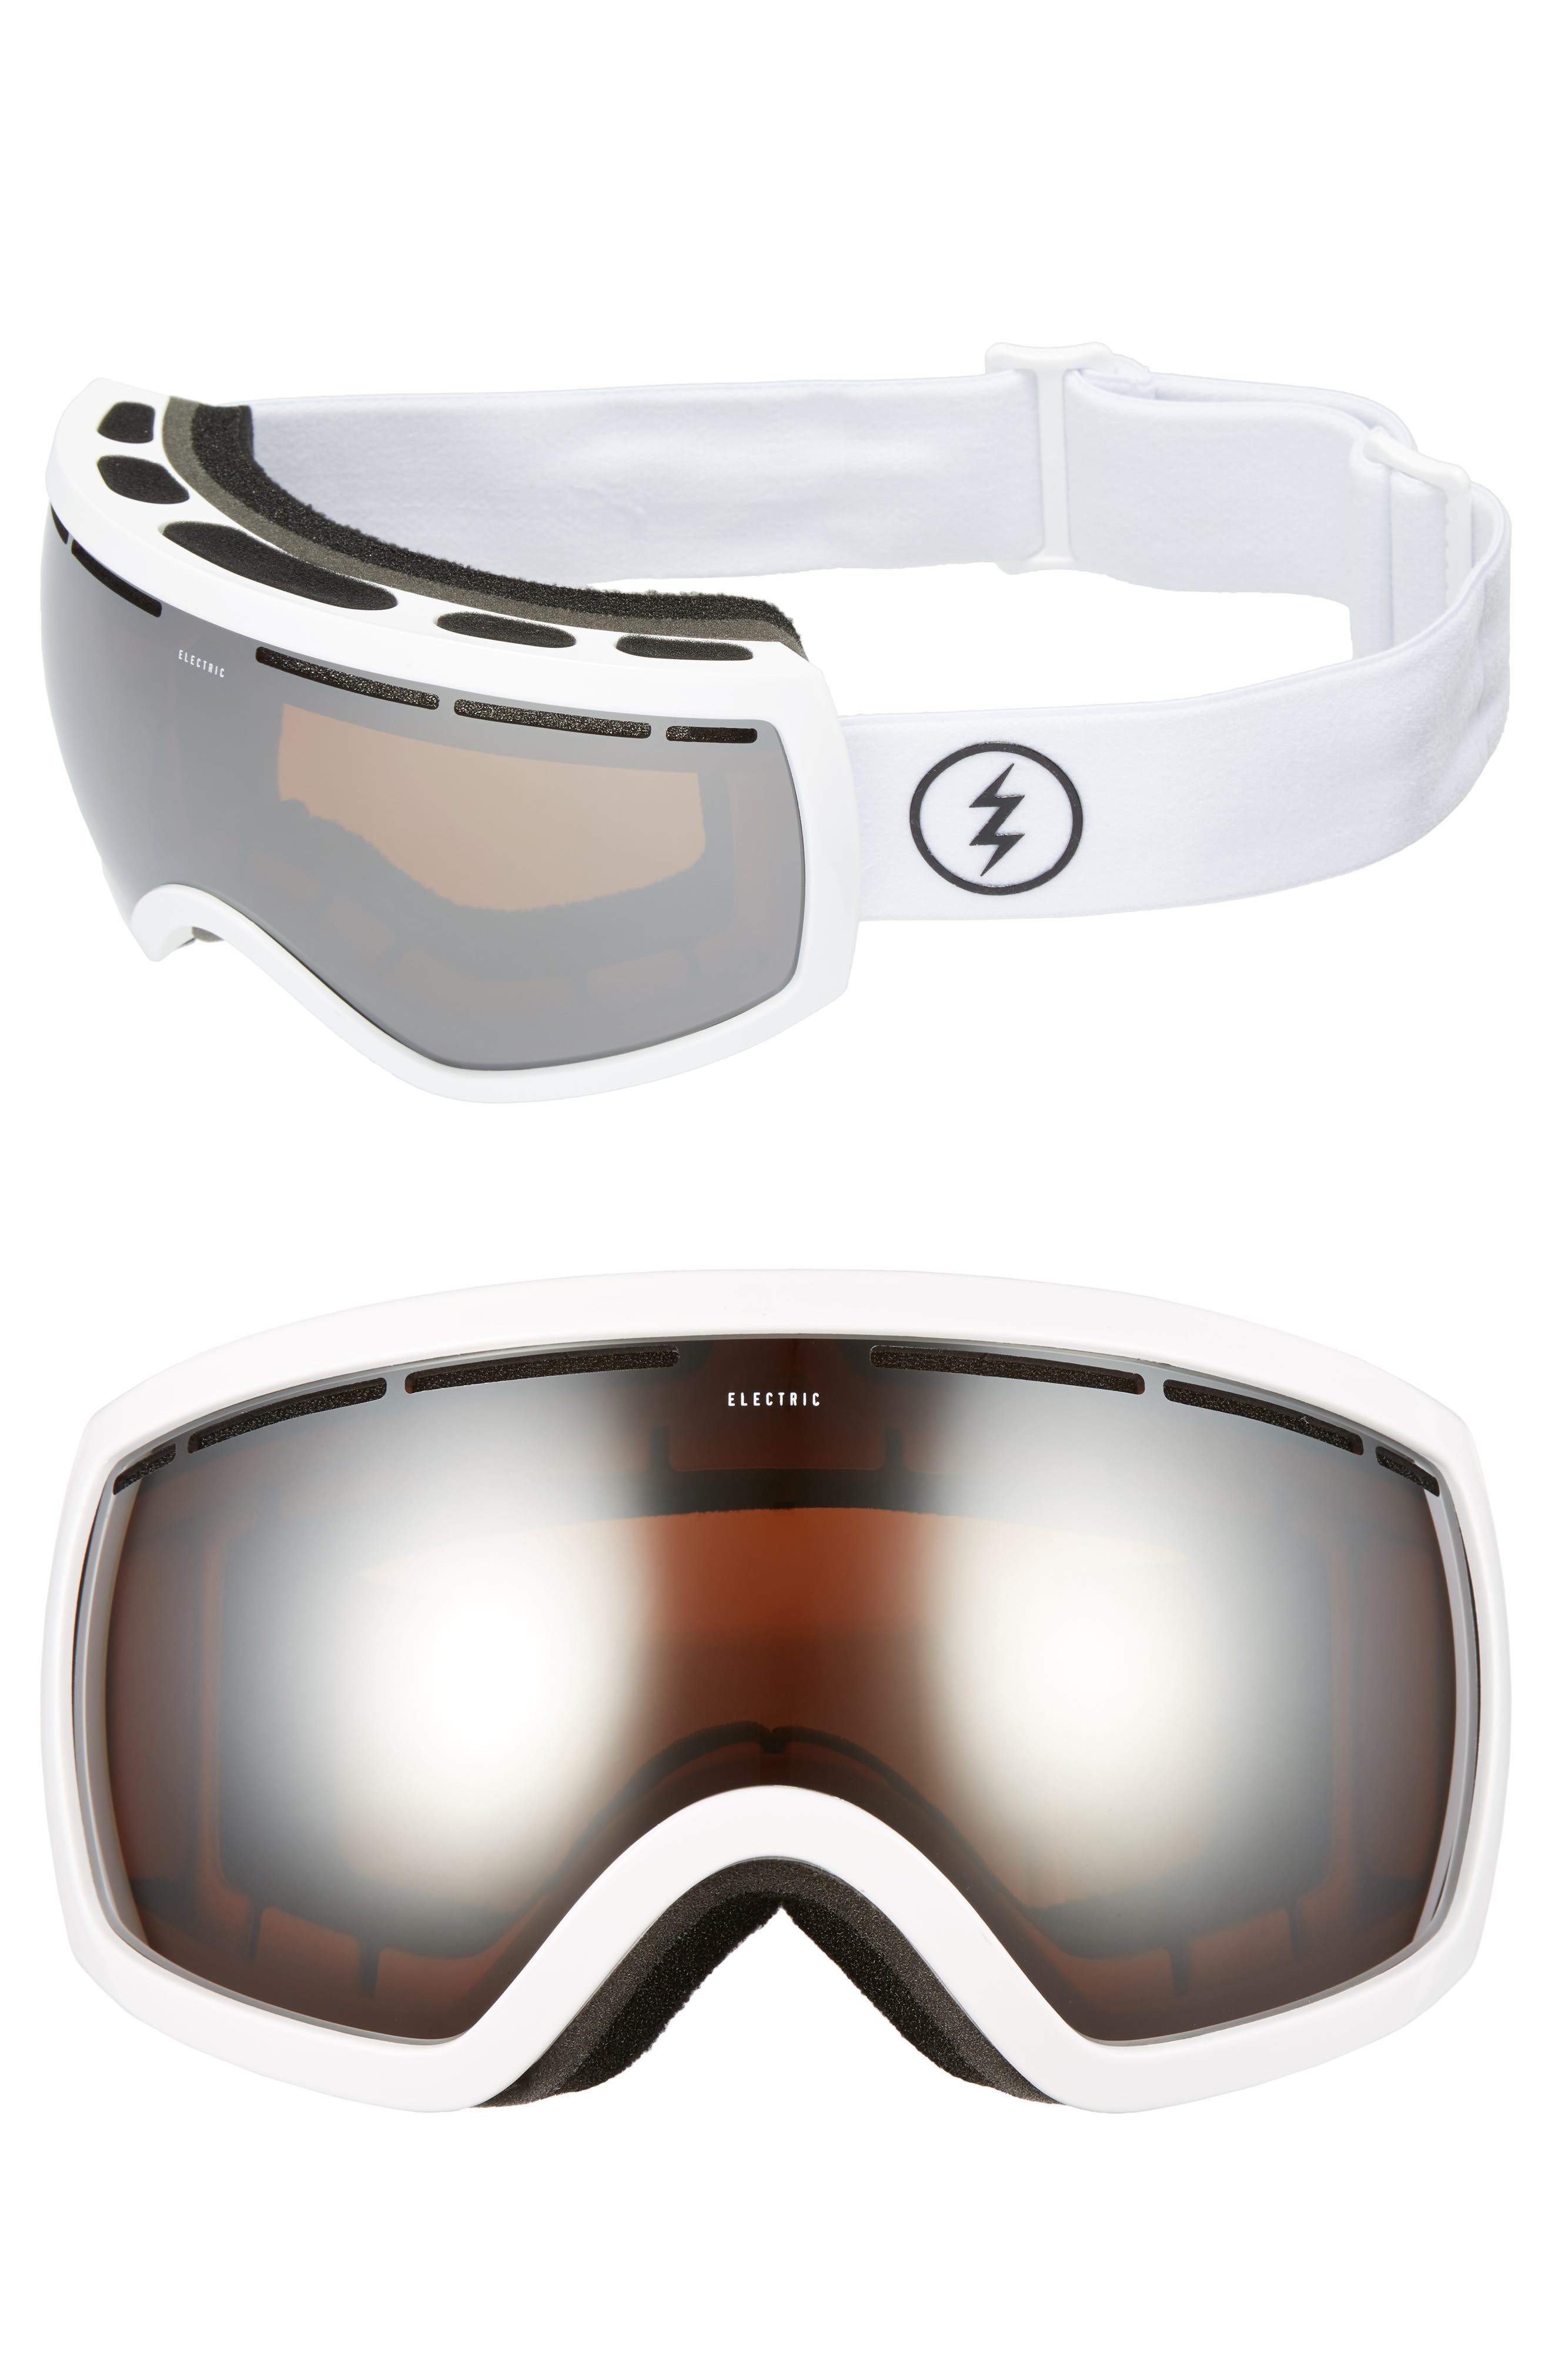 EG 2.5 215mm Snow Goggles,                             Main thumbnail 5, color,